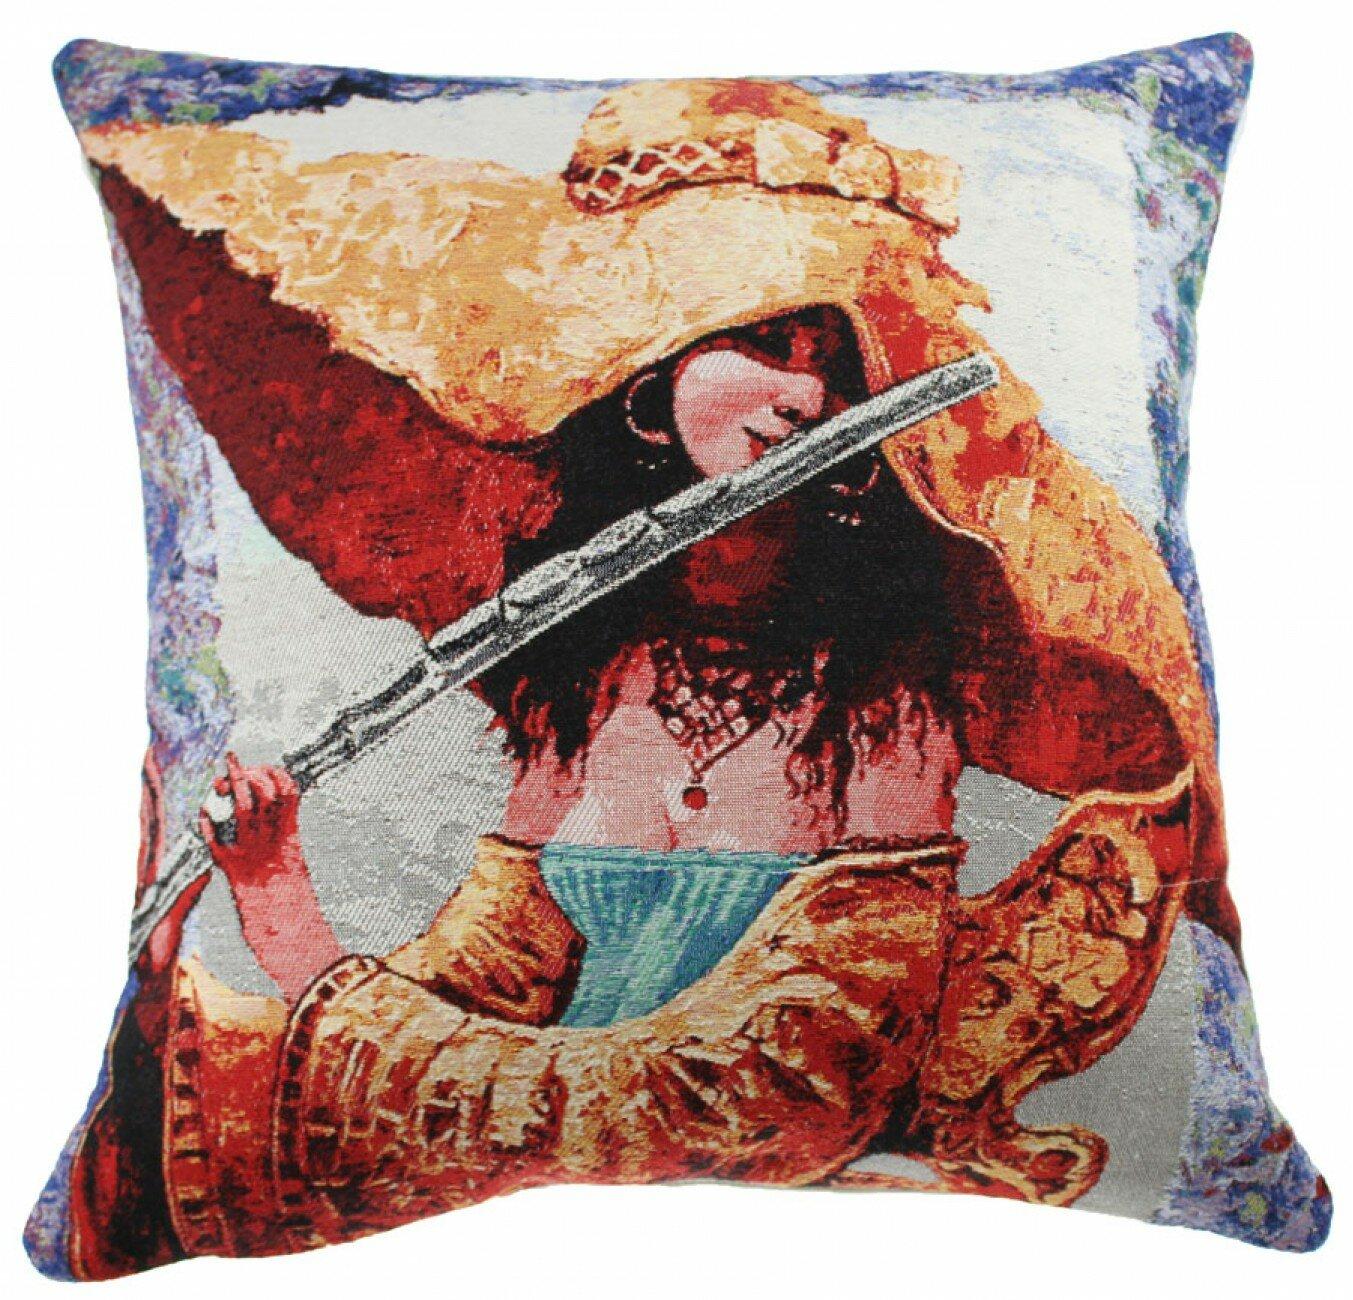 Astoria Grand Decorative Cotton Throw Pillow Cover Wayfair